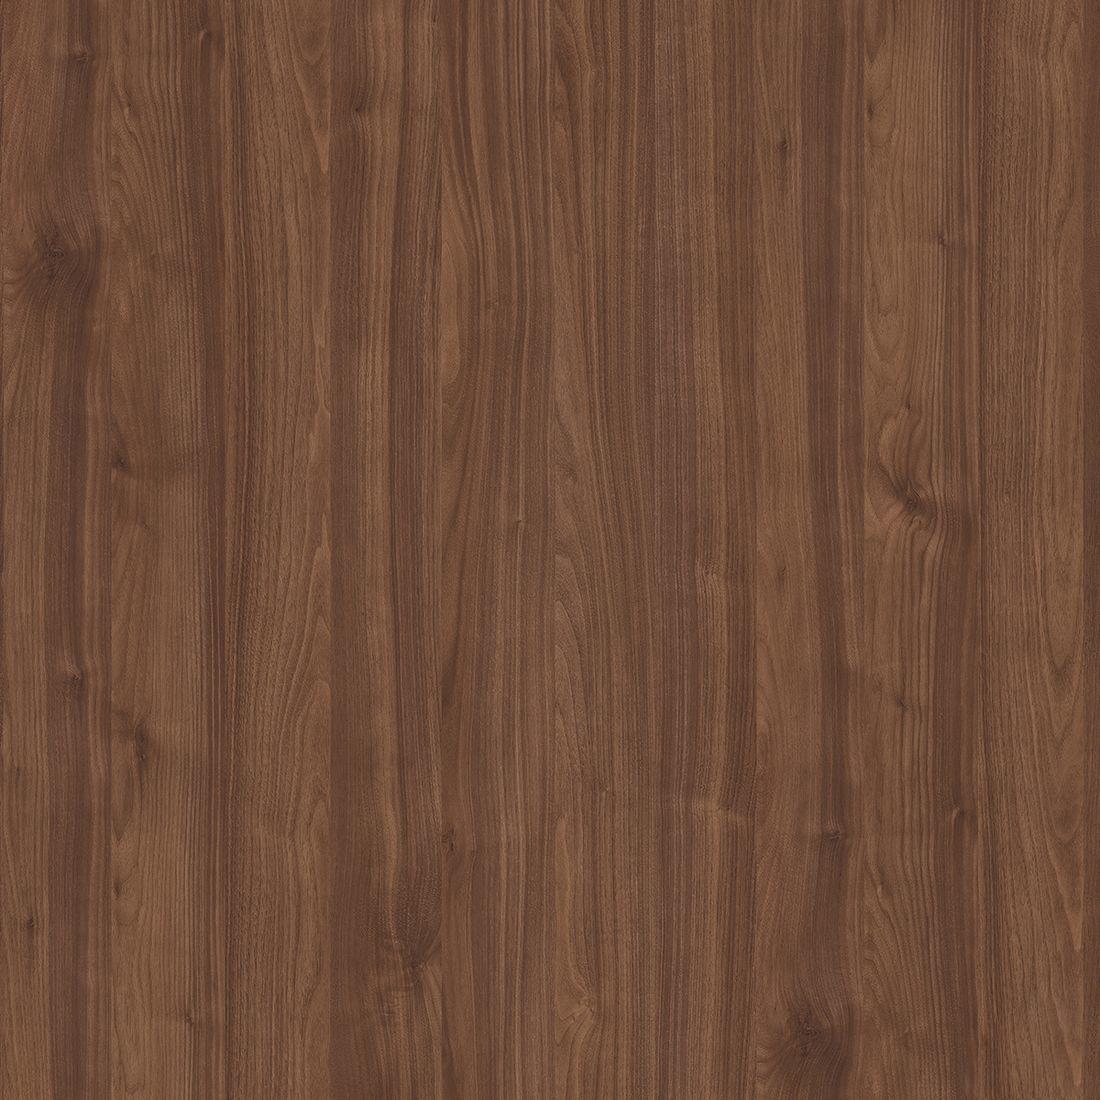 +20% К015PW Морское дерево винтаж